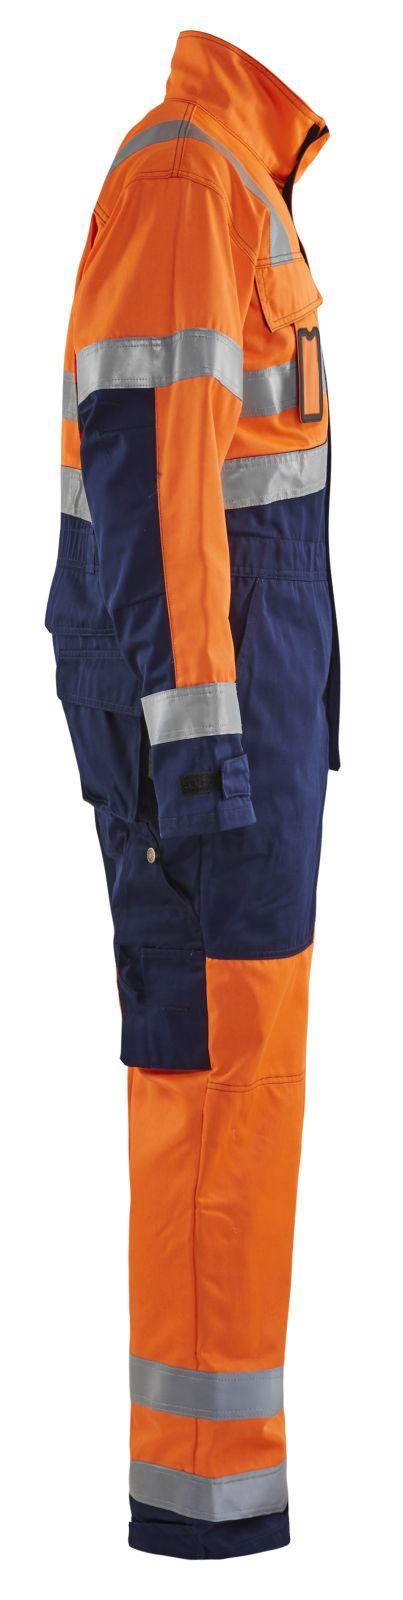 Blaklader Overalls 63731804 High Vis oranje-marineblauw(5389)